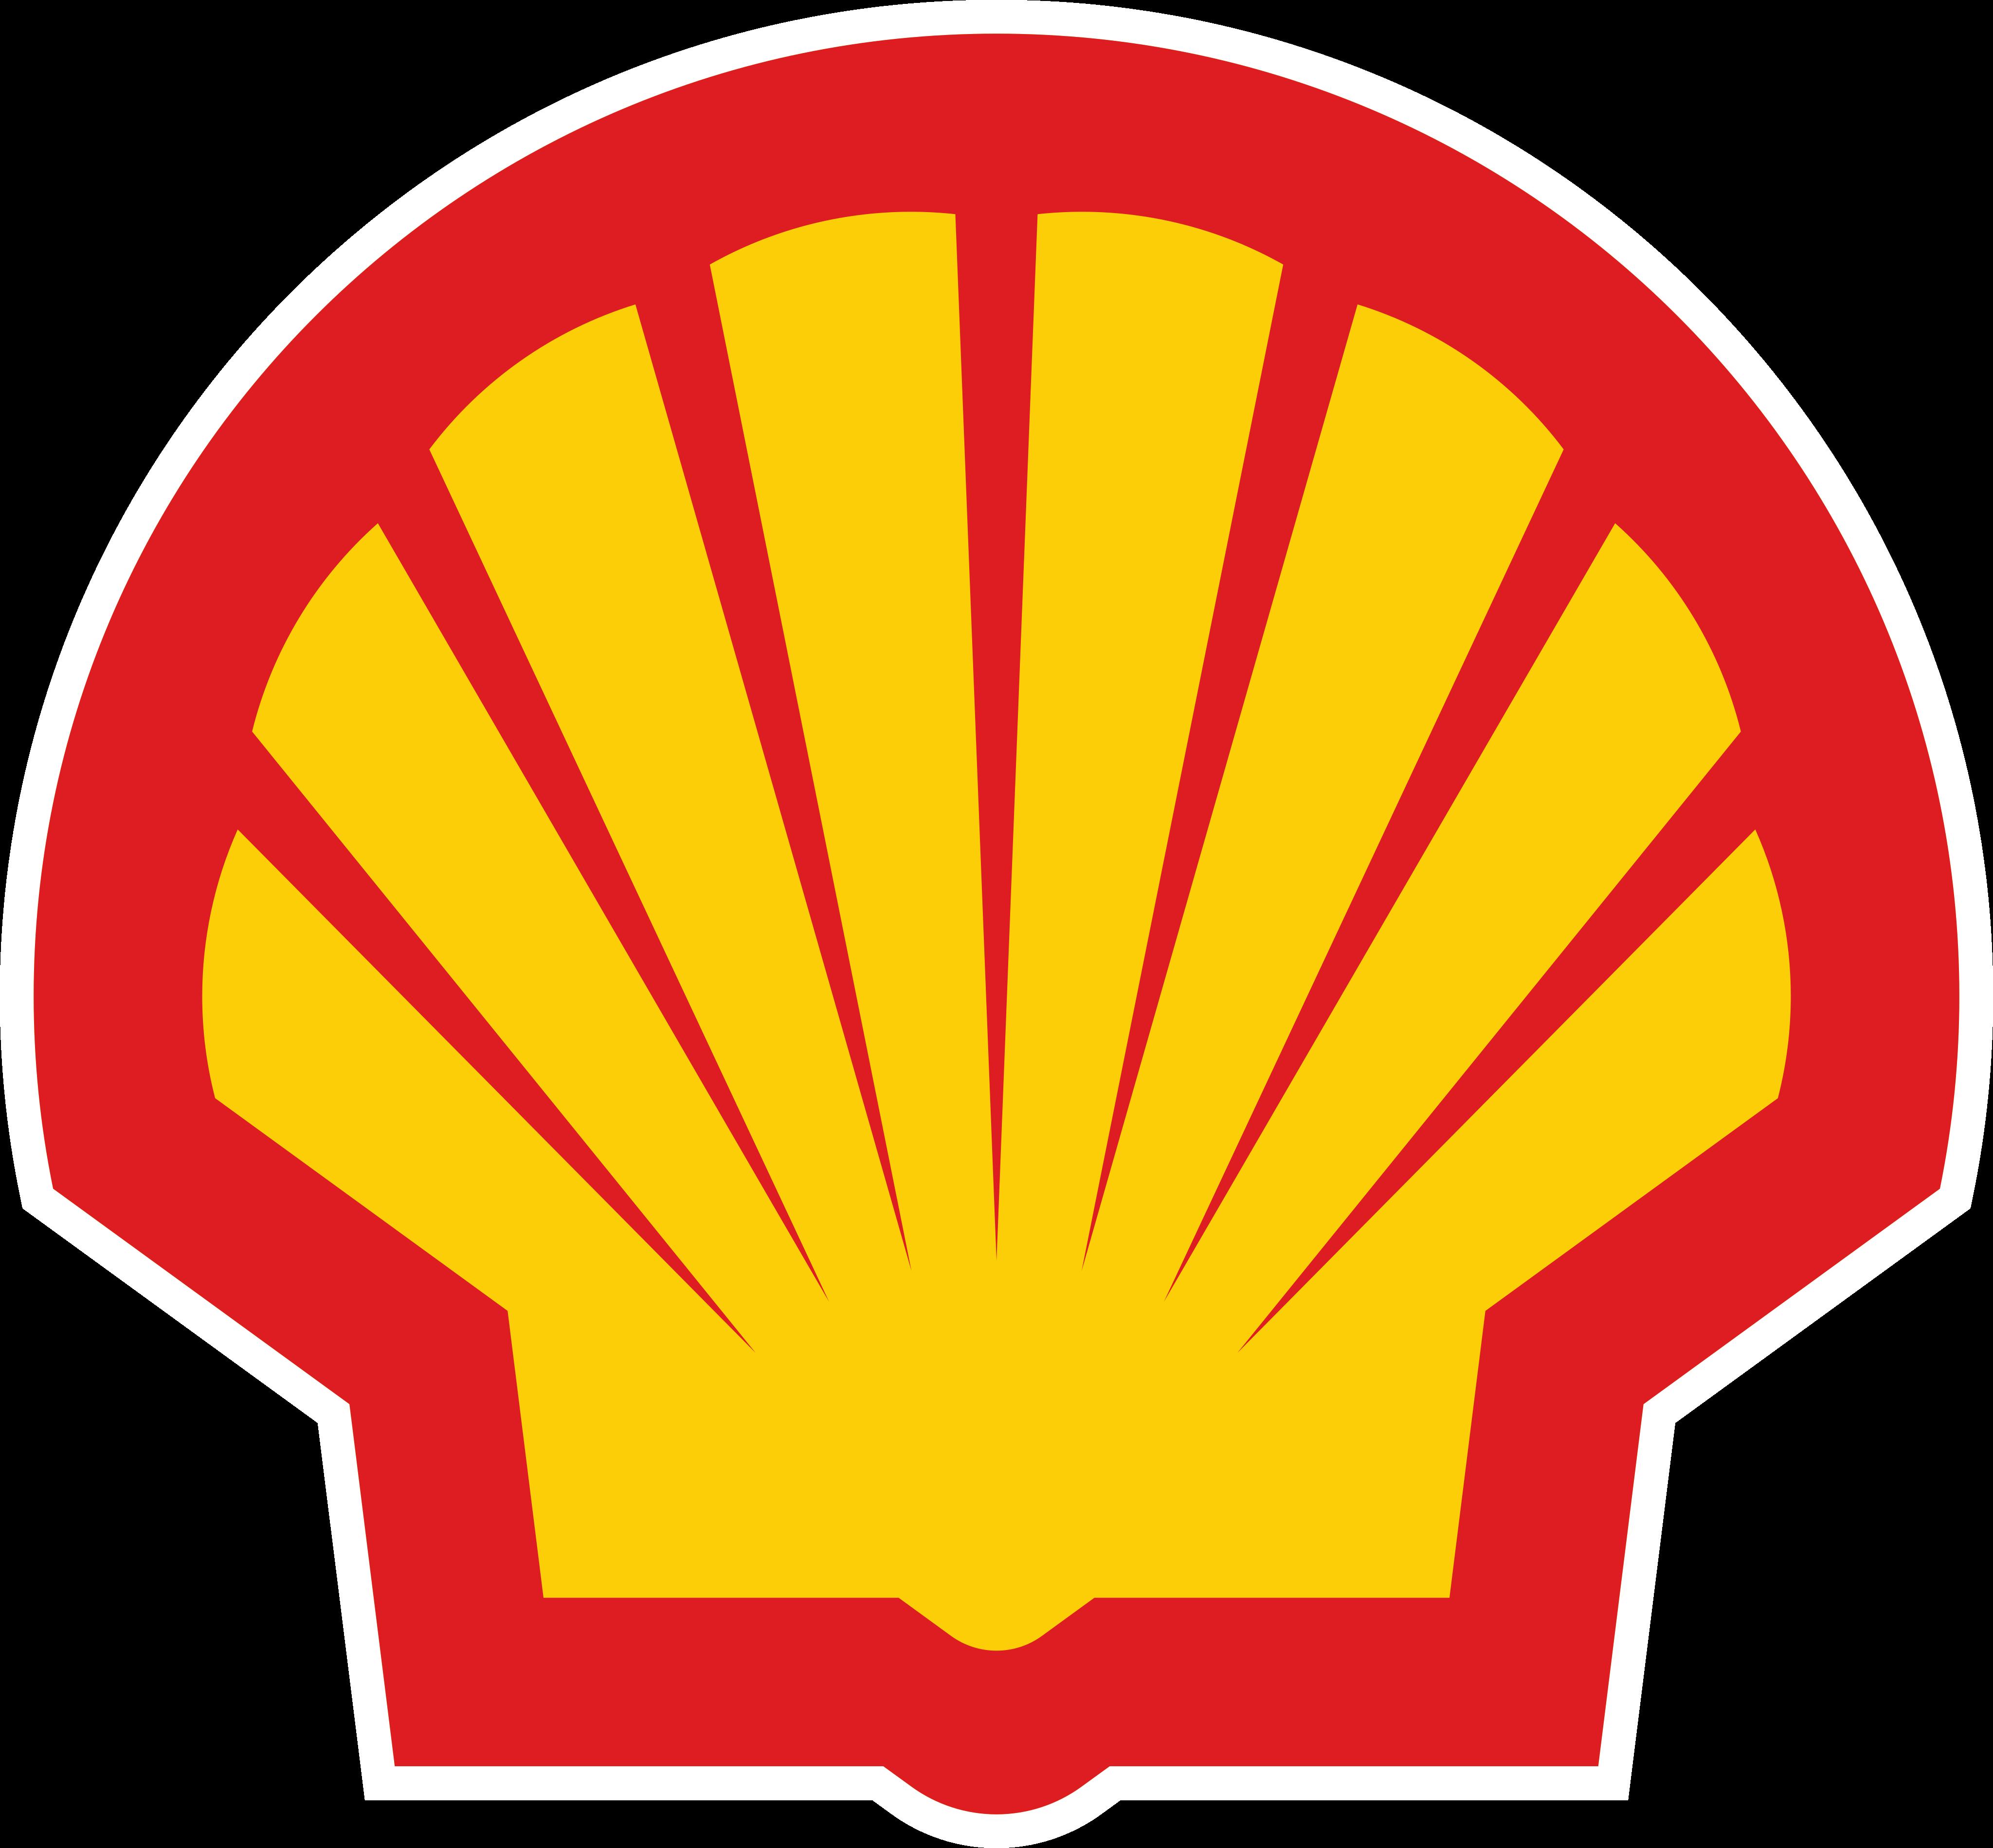 shell logo - Shell Logo